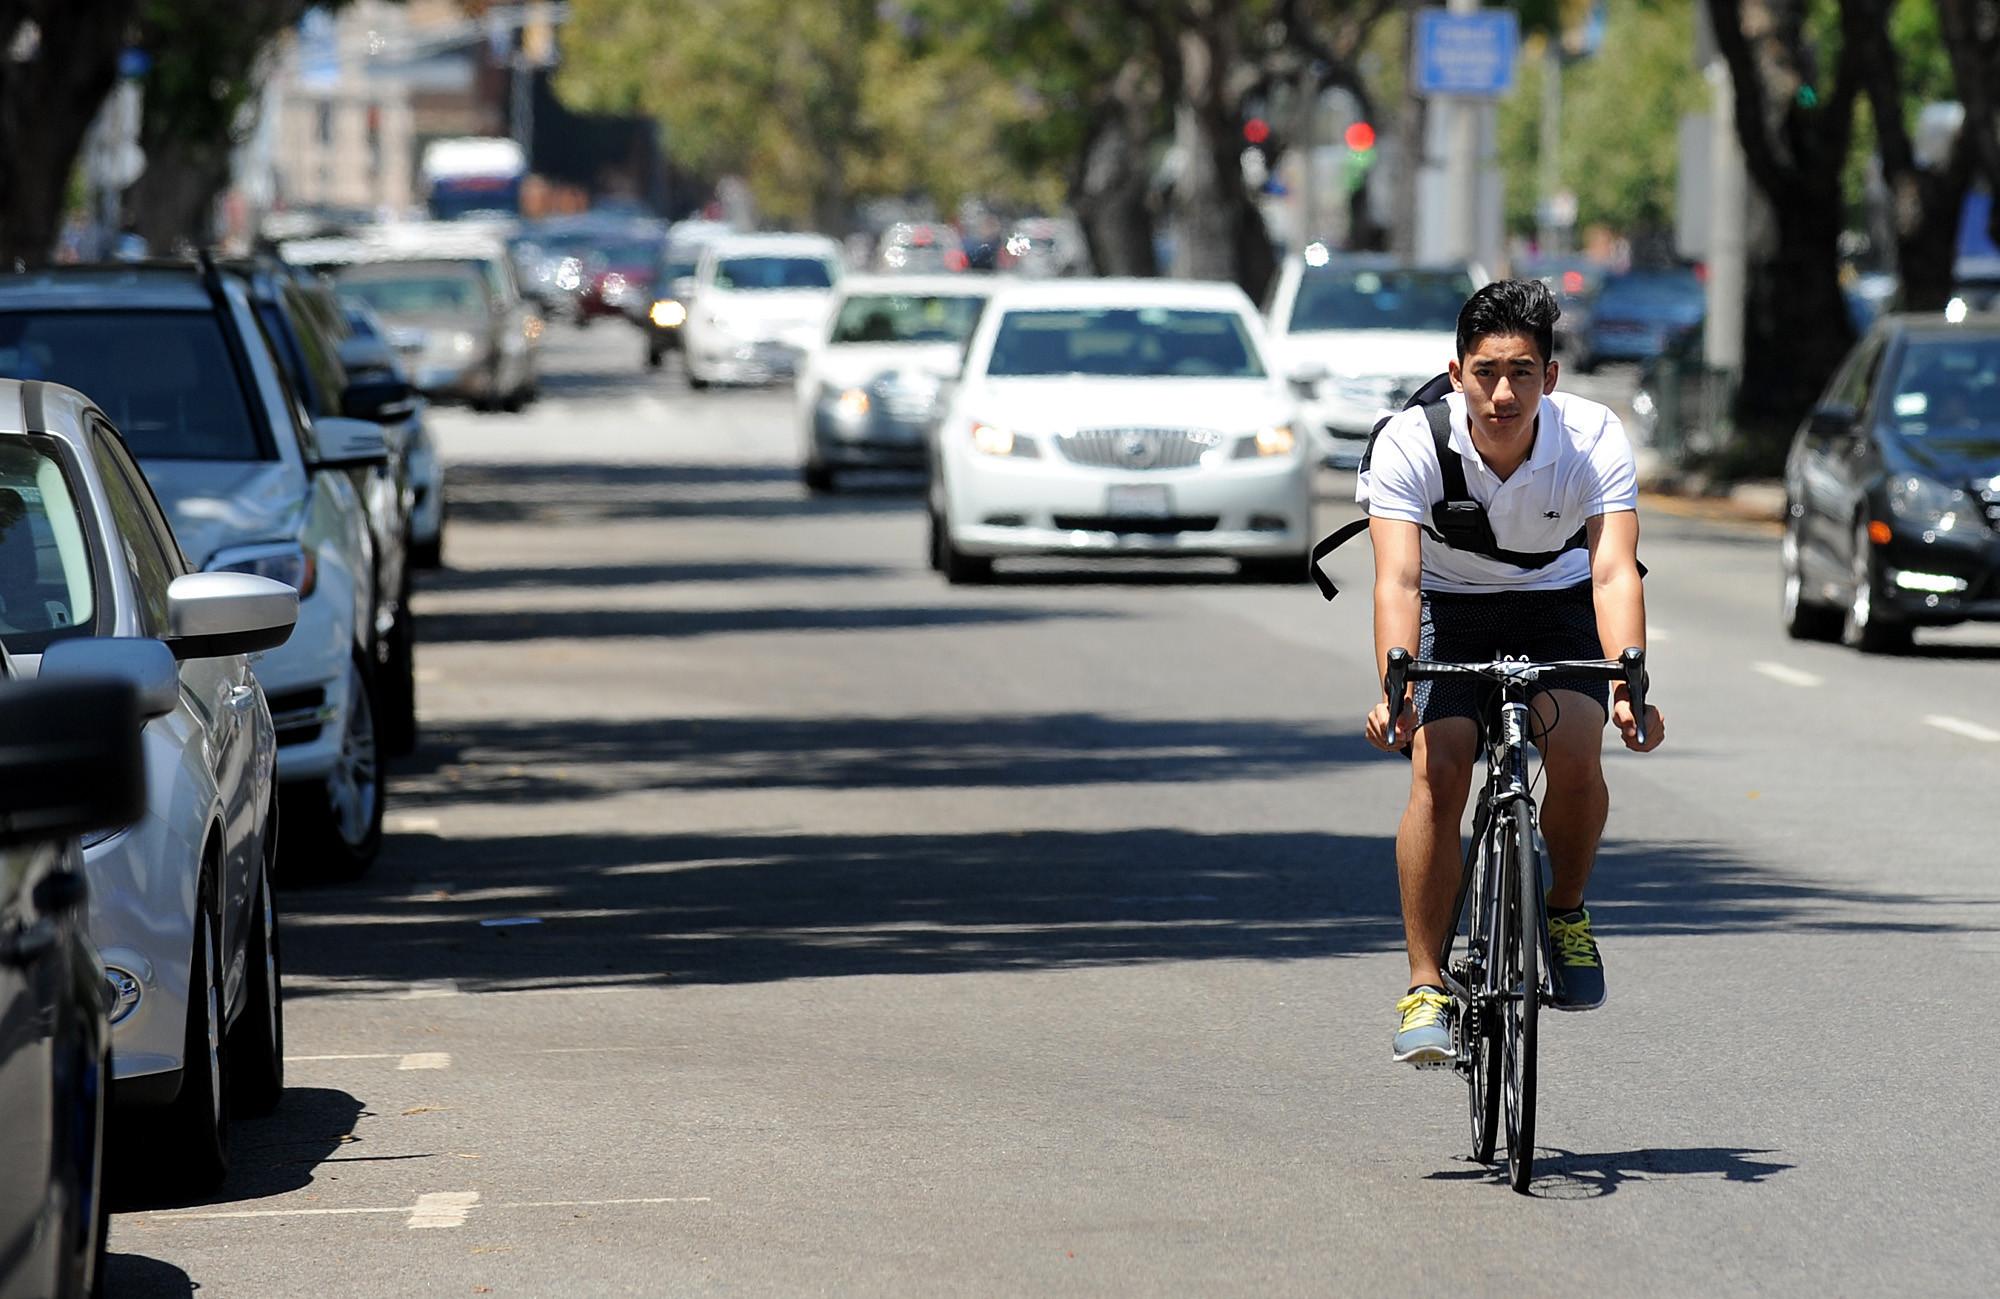 Westwood bike lane proposal ignites strong feelings on both sides la times